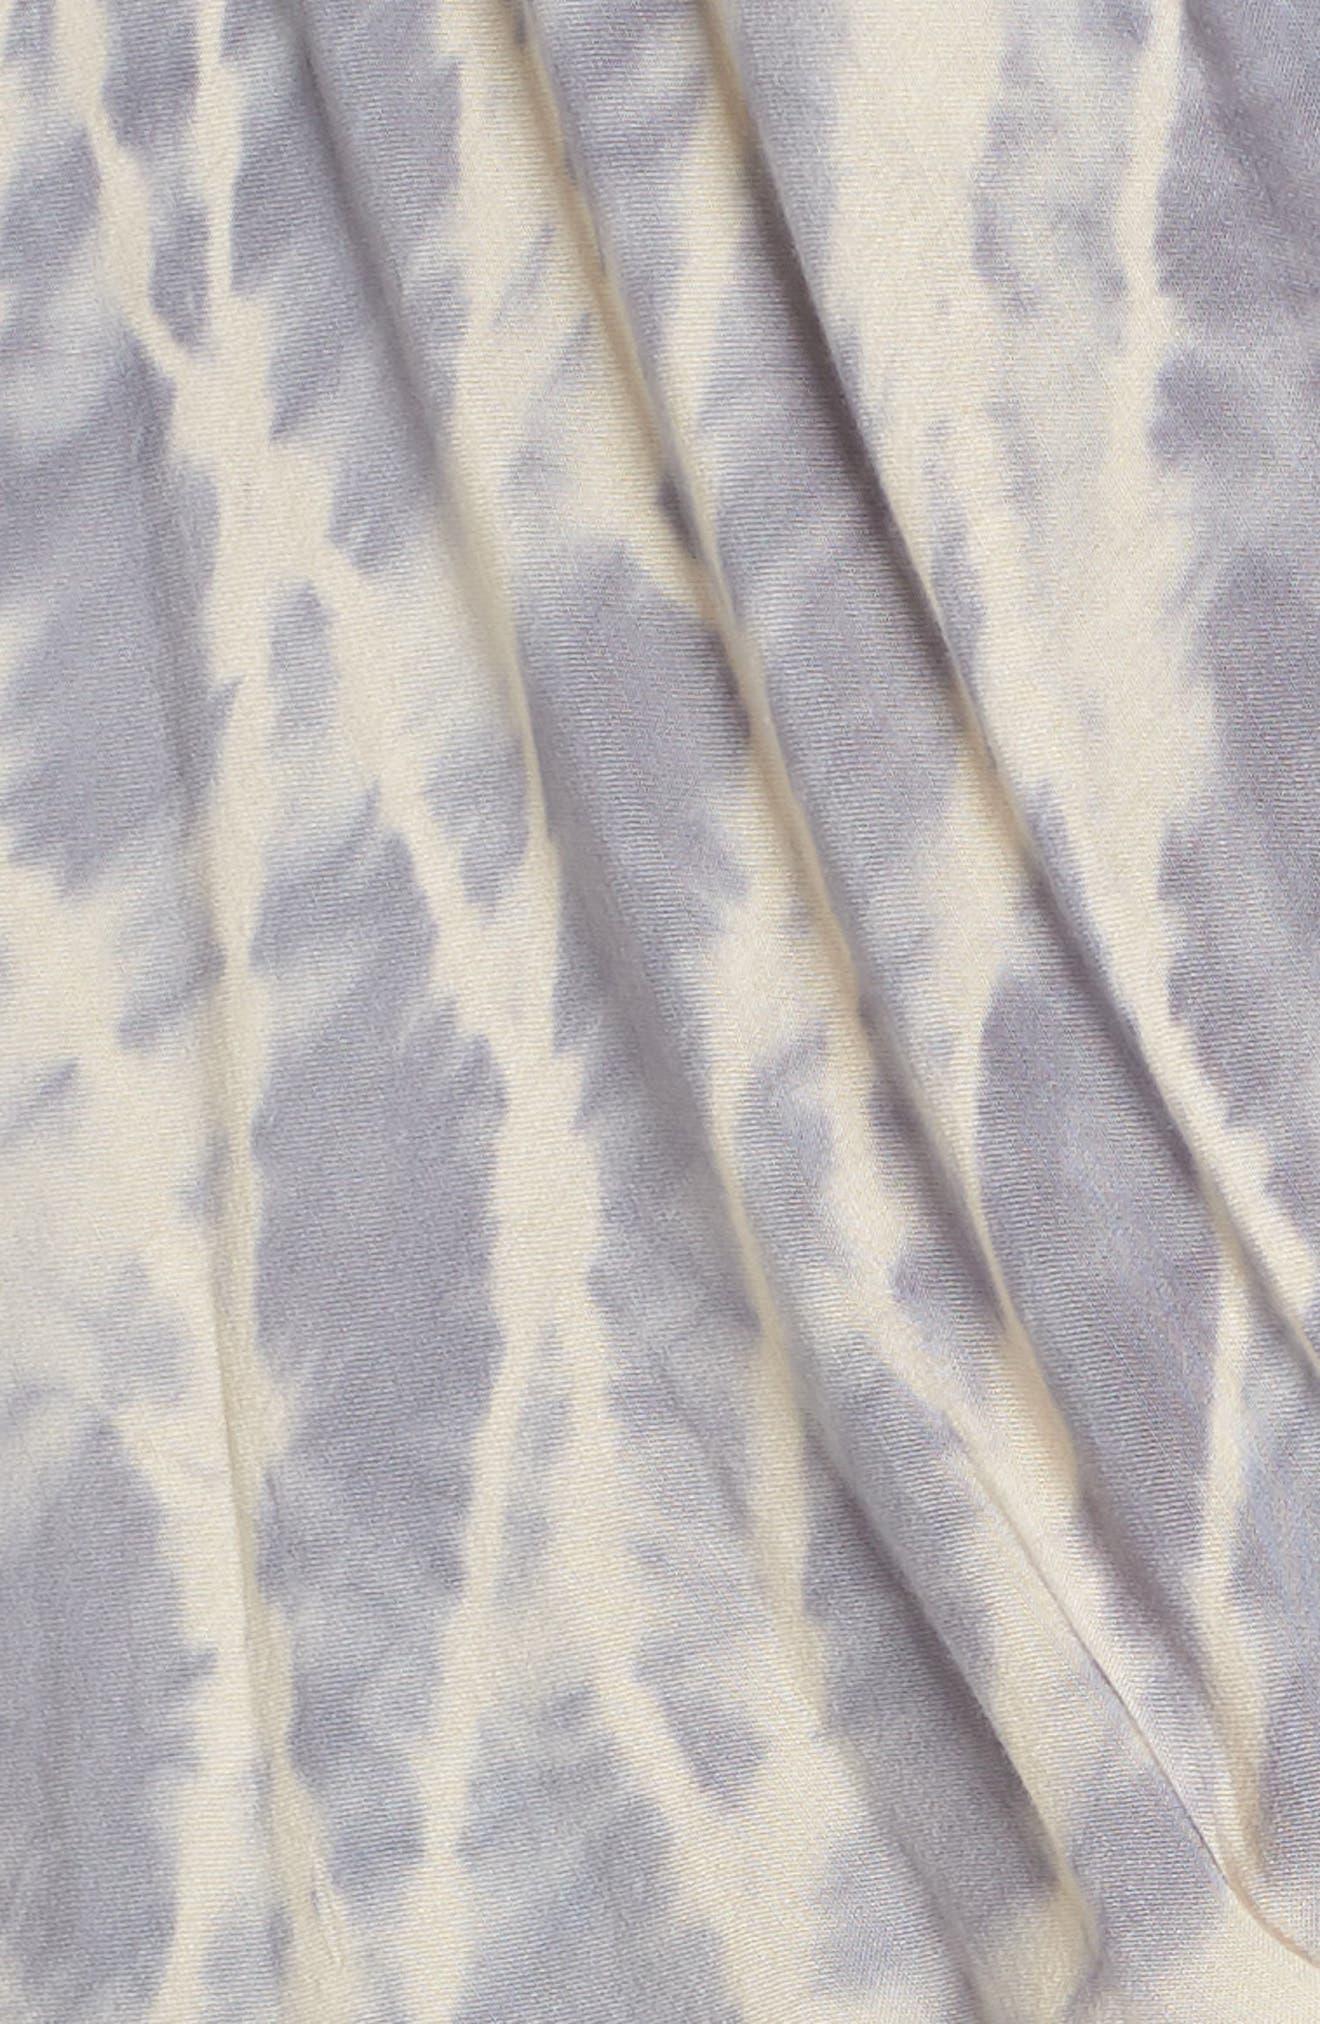 Tie Dye Surplice Cover-Up Romper,                             Alternate thumbnail 5, color,                             PEACH/ GREY